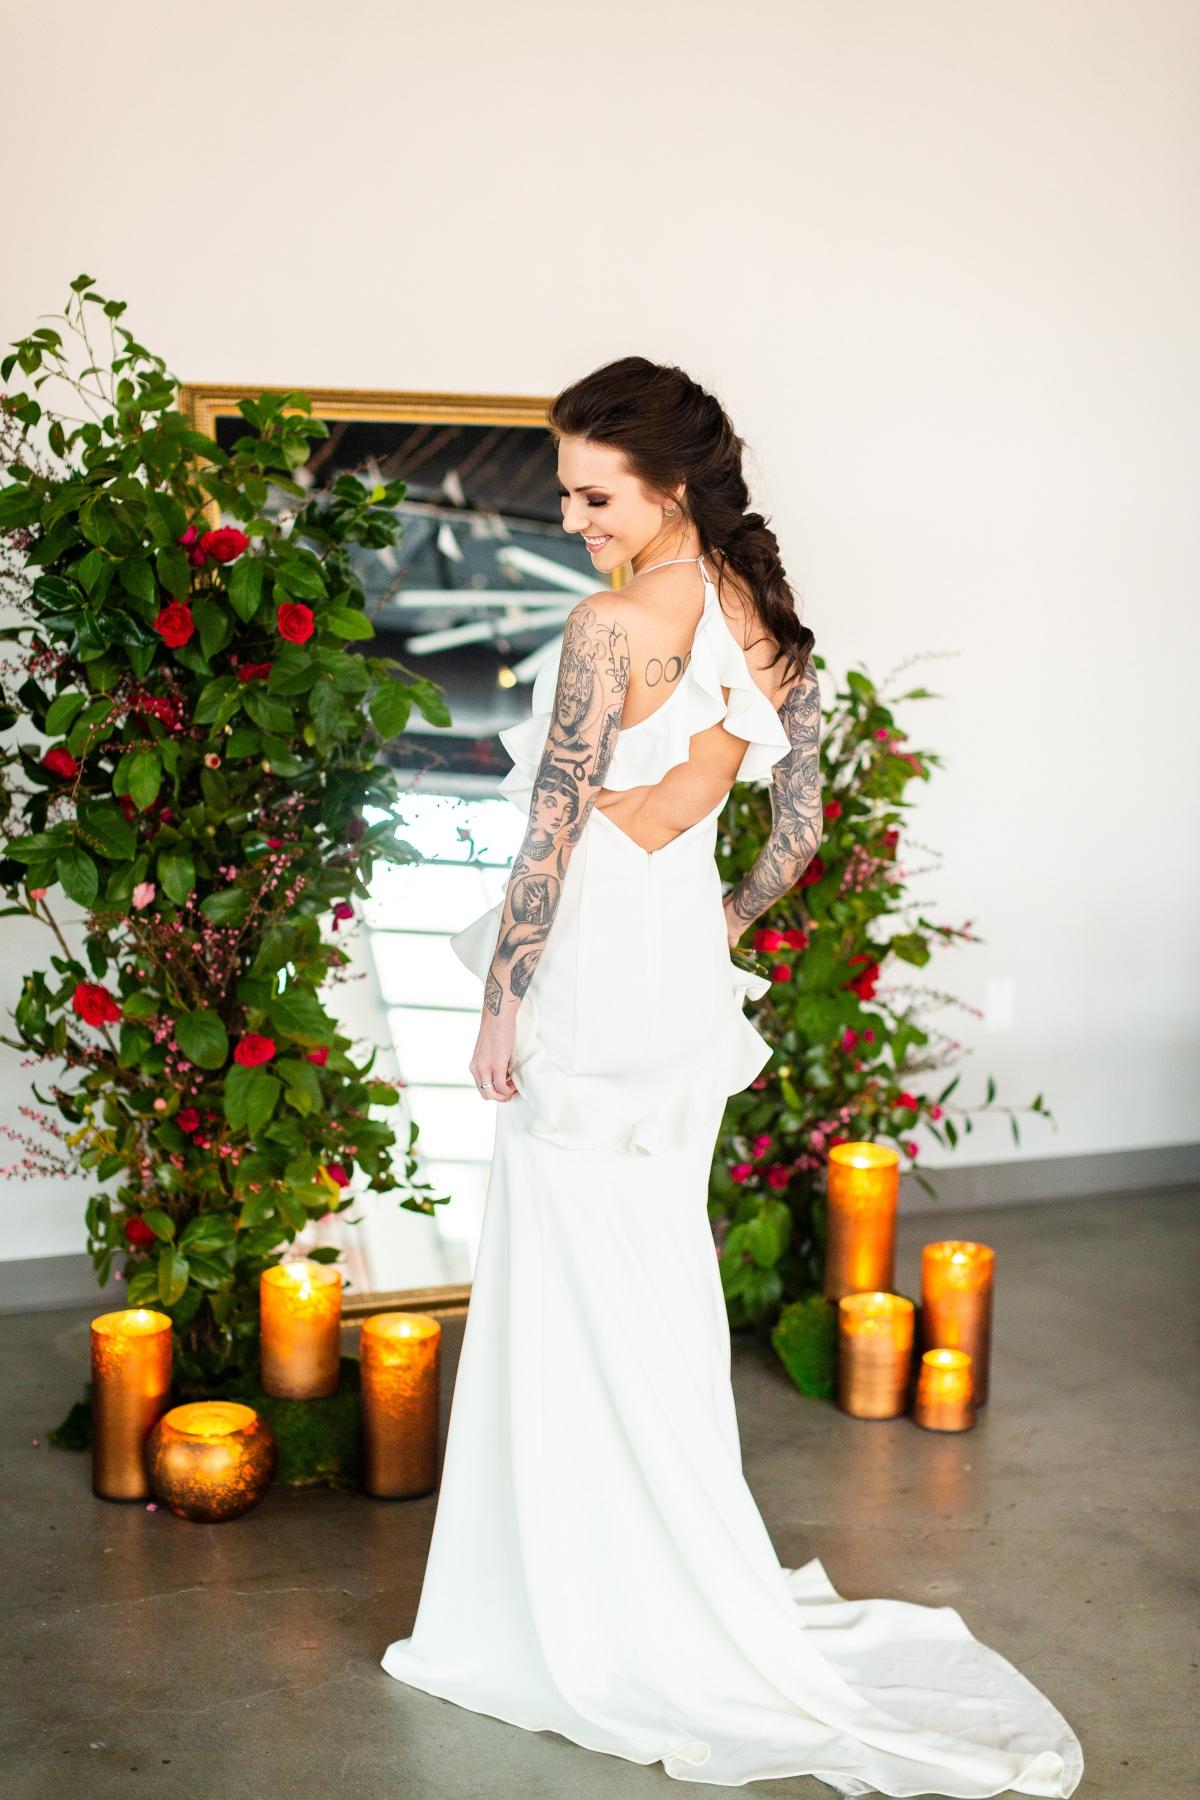 Edgy Romance Chicago Wedding Inspiration Alexandra Lee Photography Lakeshore in Love 295